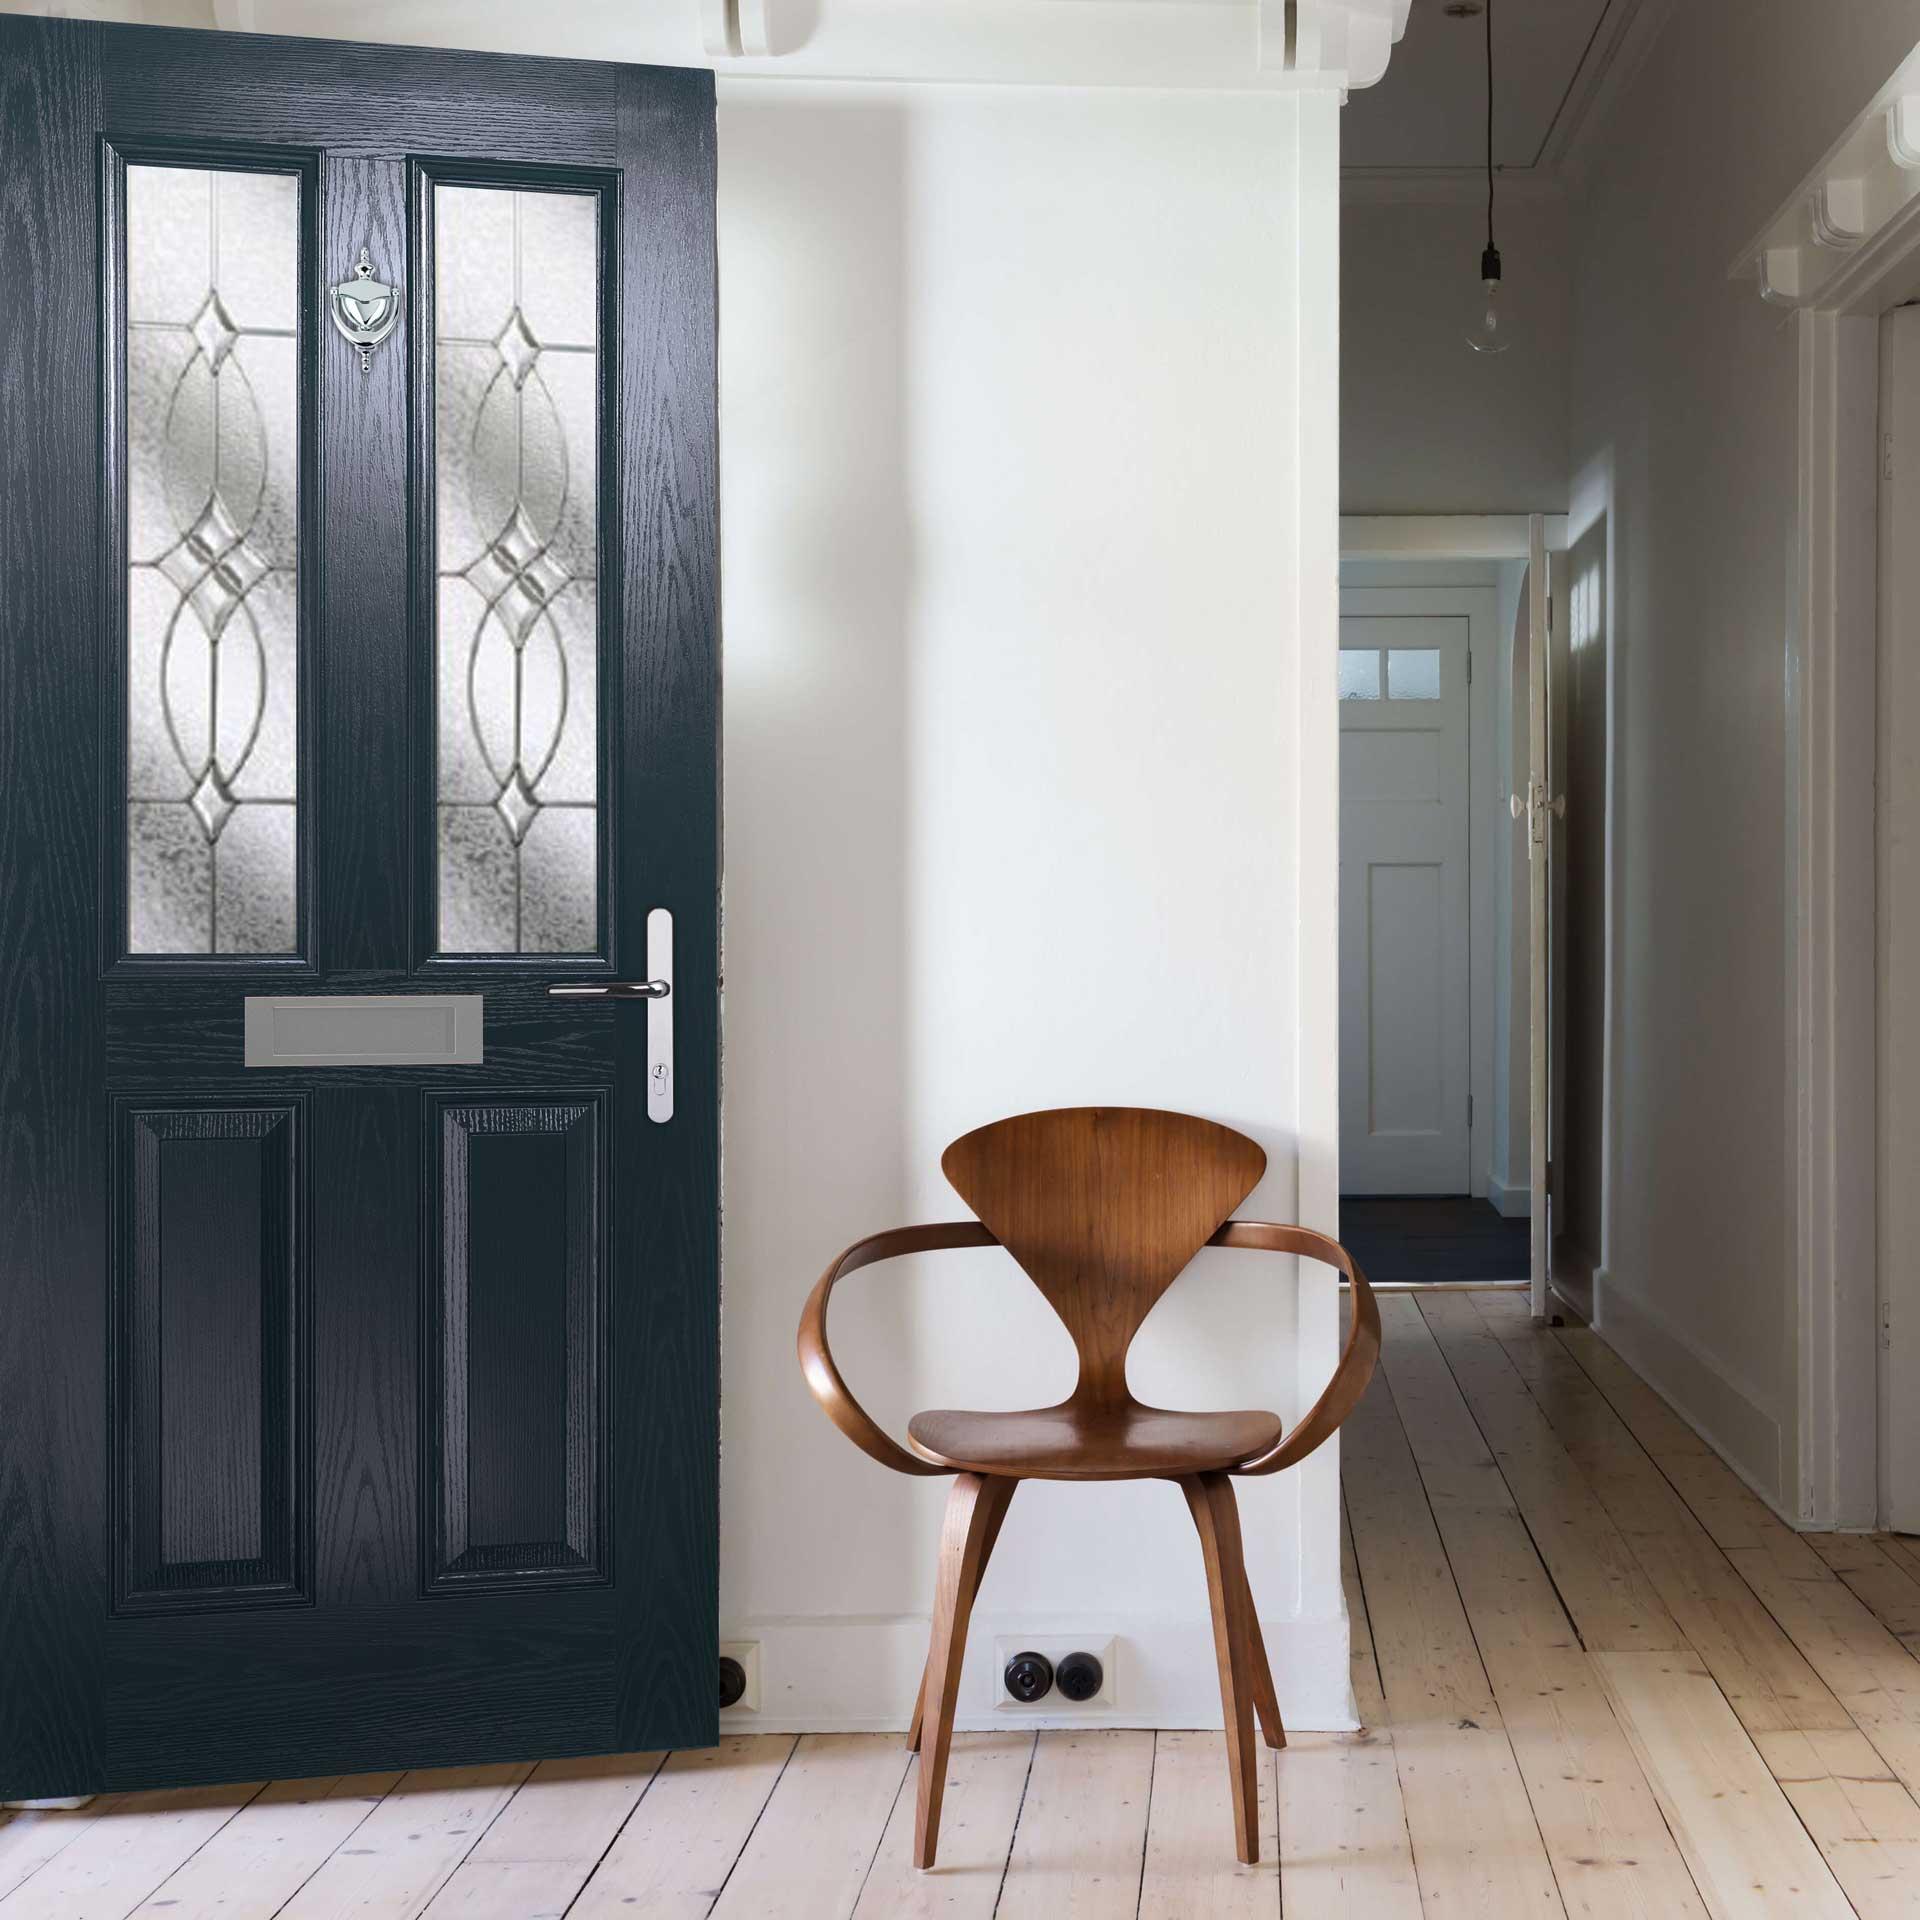 composite door prices royal leamington spa